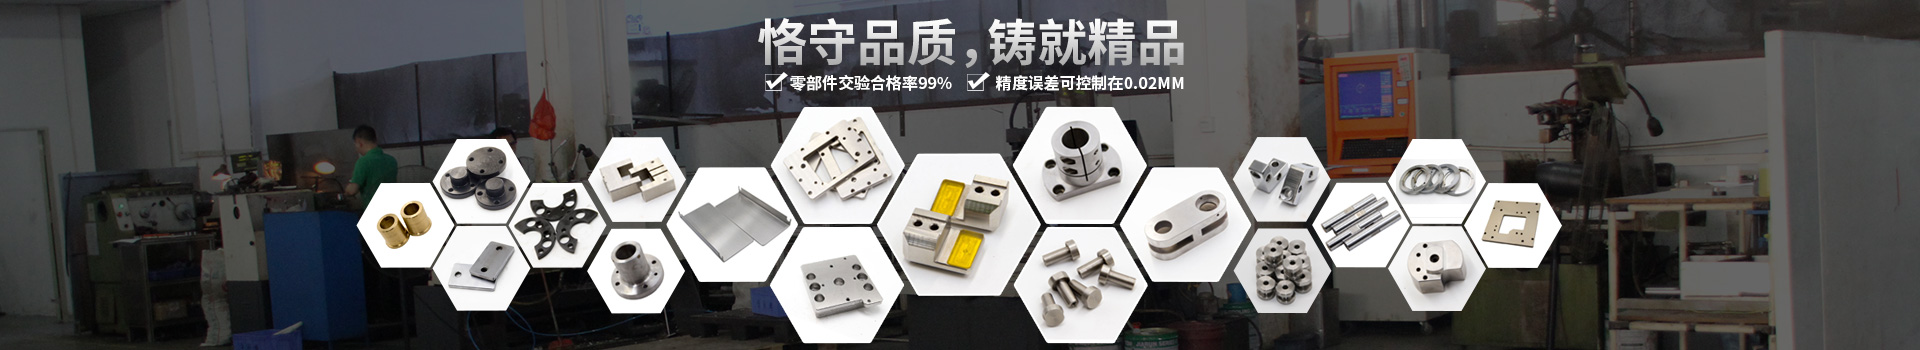 CNC精密機械加工,精密機械零件加工,深圳CNC加工廠家——恪守品質,鑄就精品